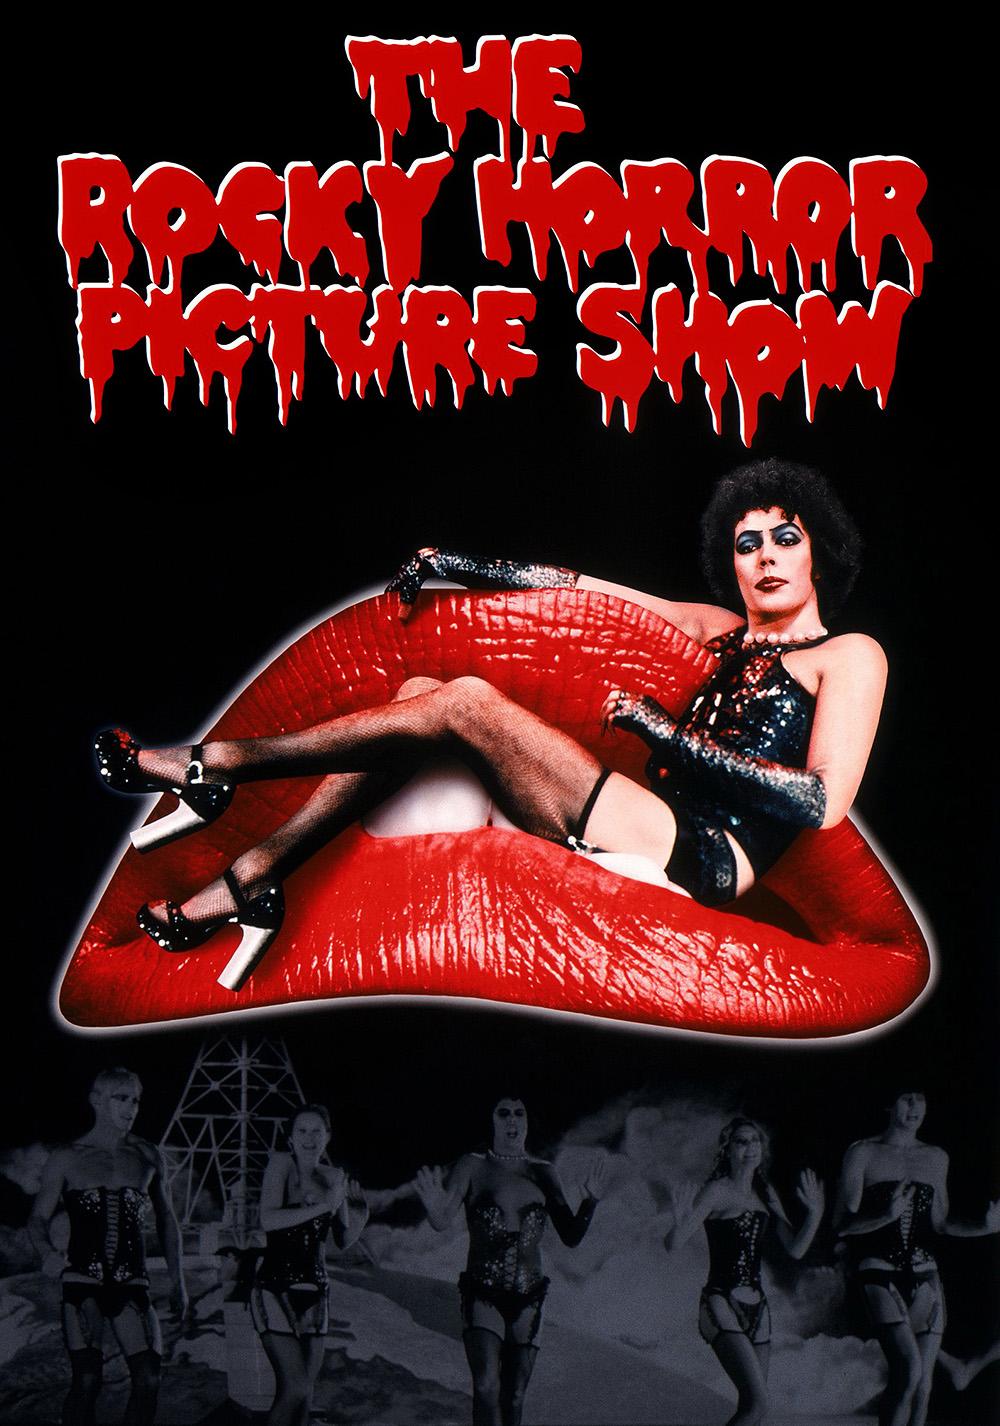 The Rocky Horror Picture Show | Movie fanart | fanart.tv